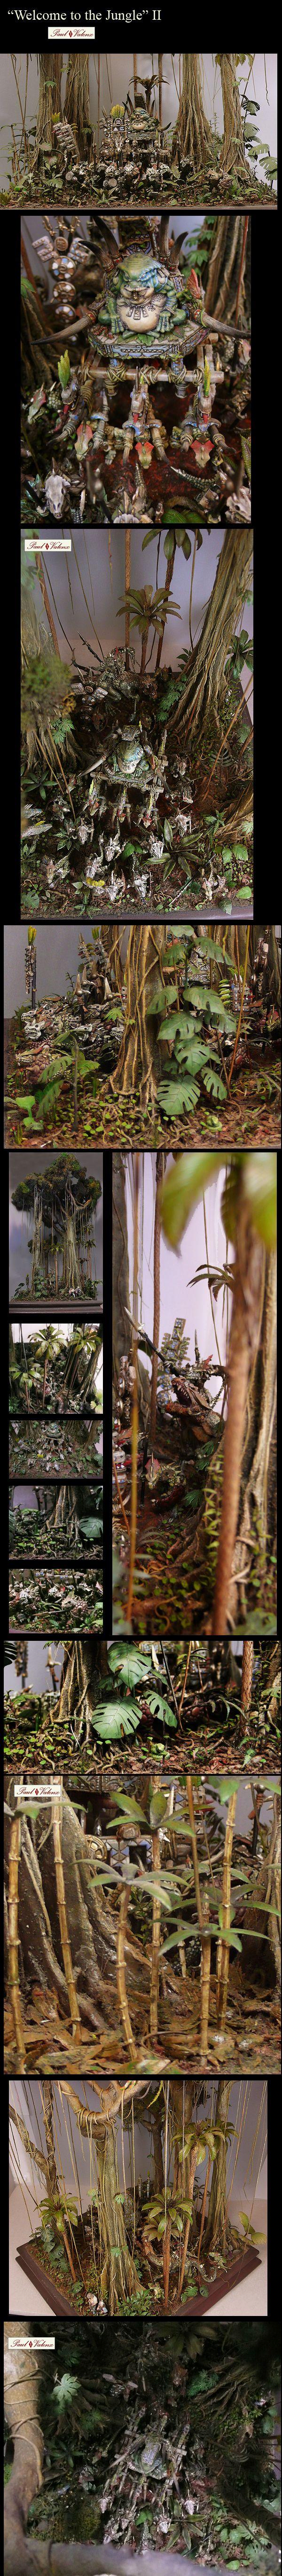 Welcome to the Jungle II